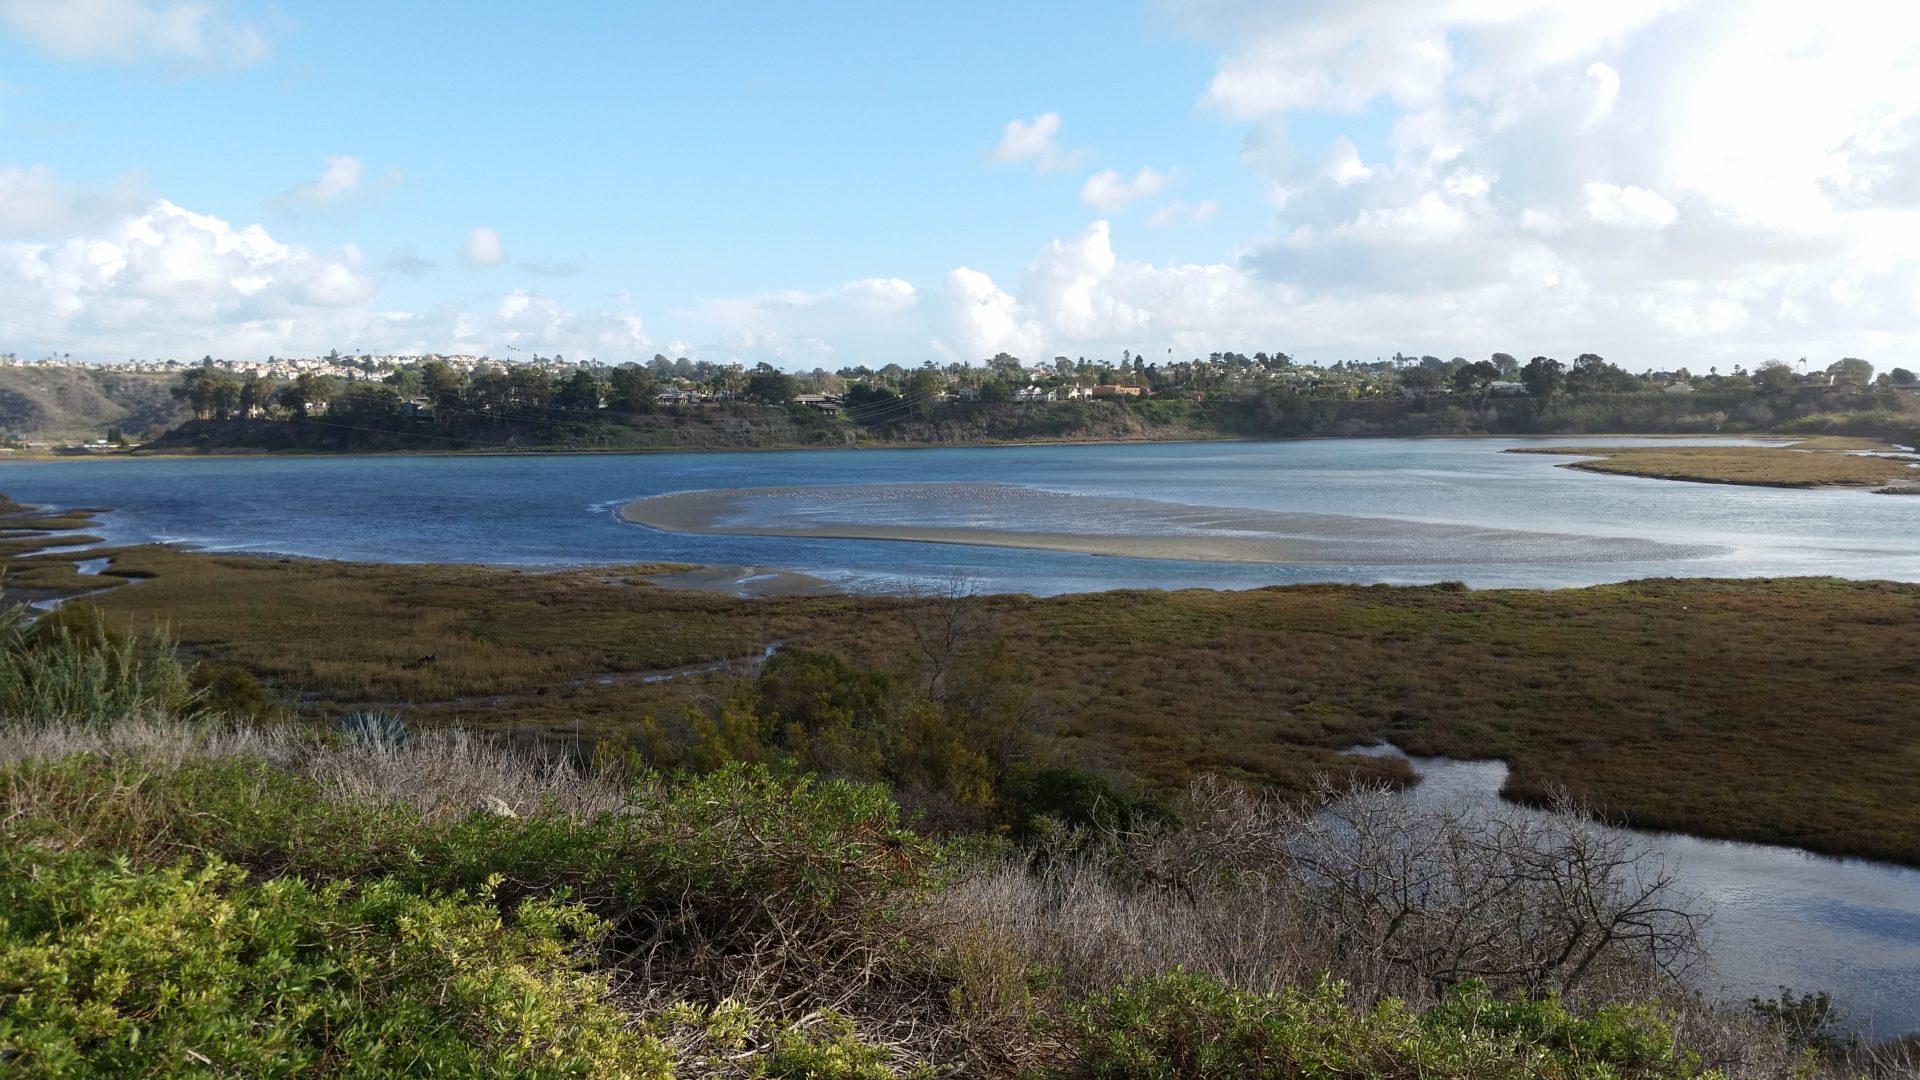 Lagoon at Low Tide